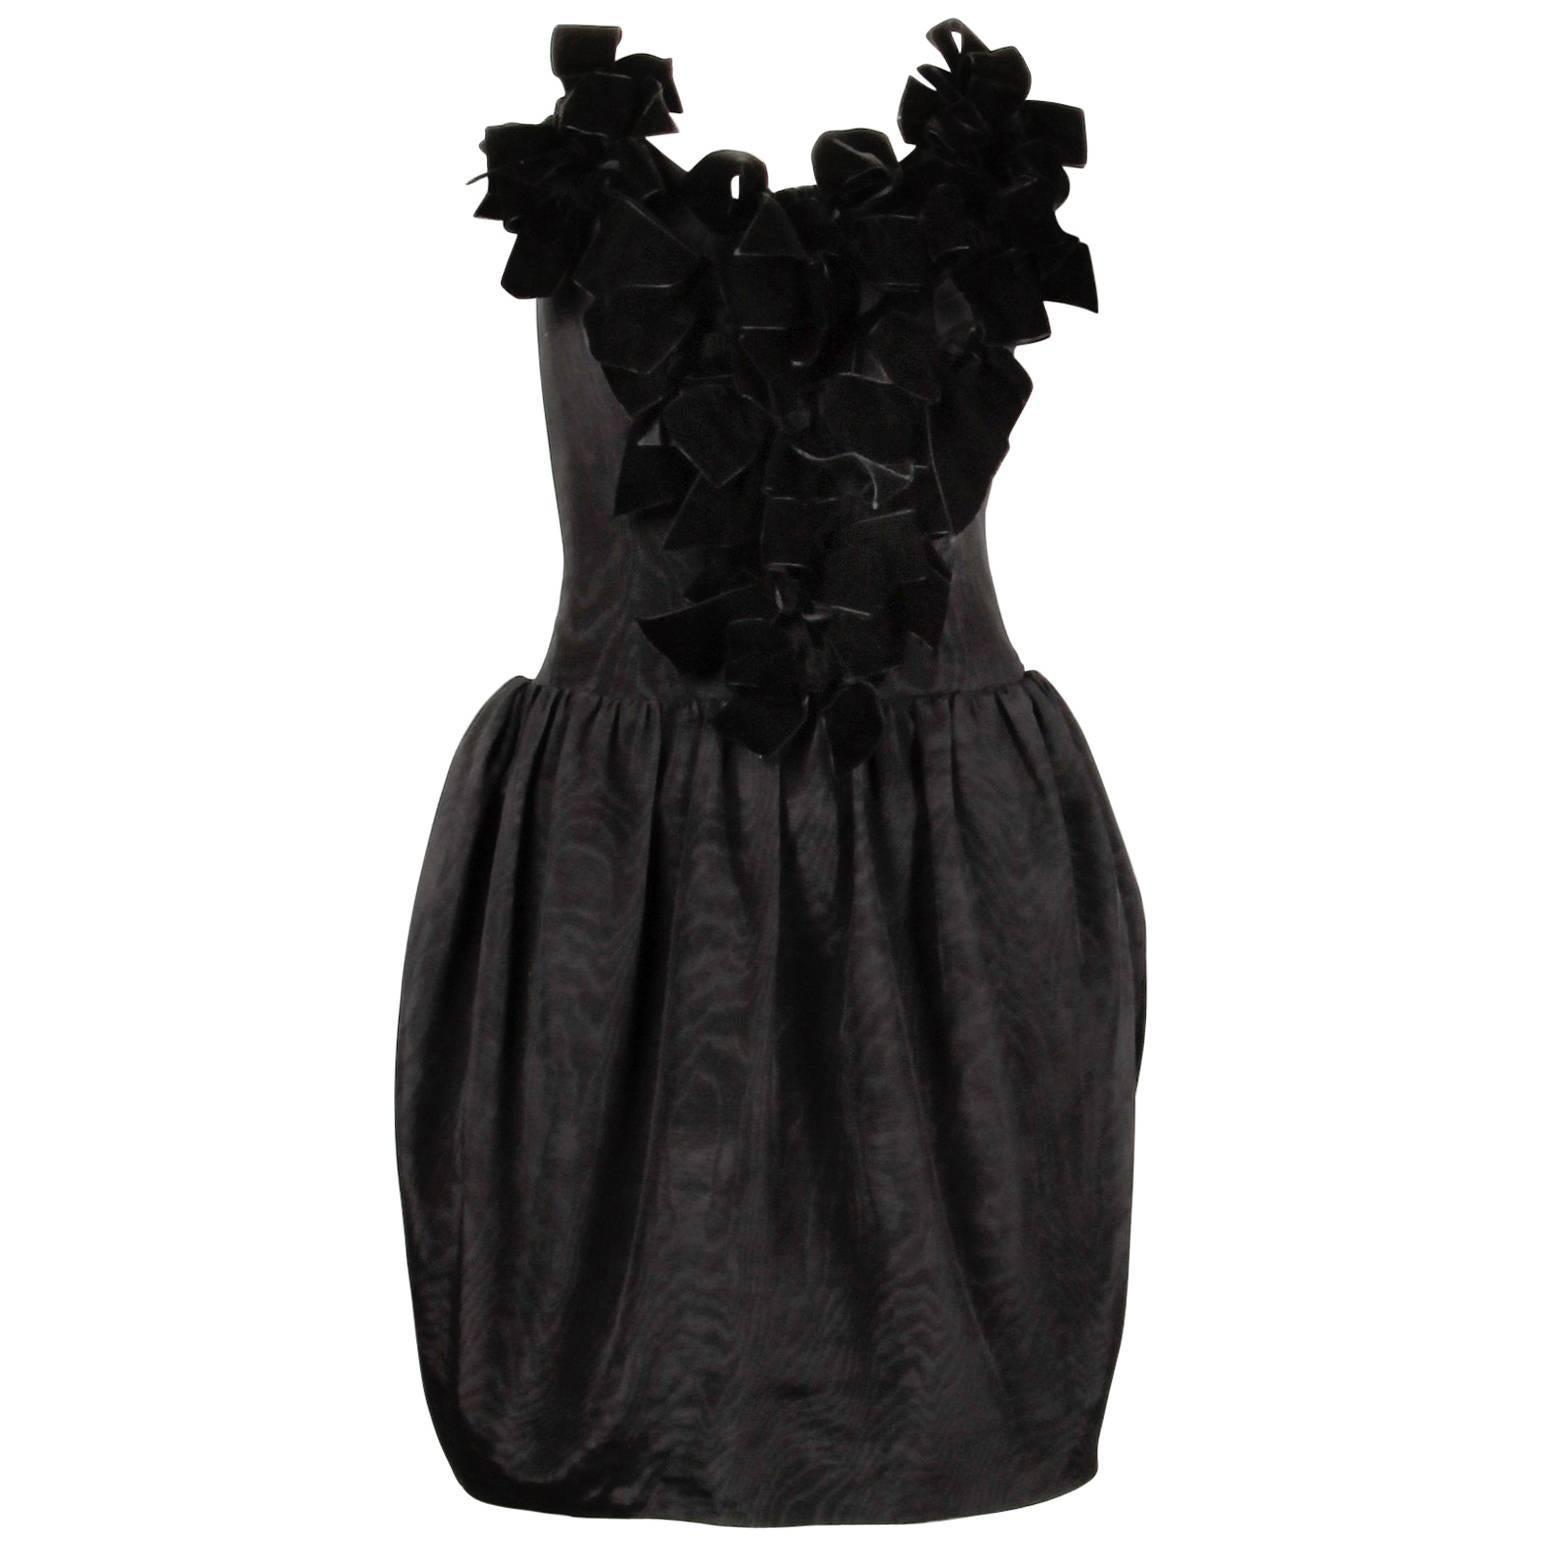 1980s Cocktail Dress